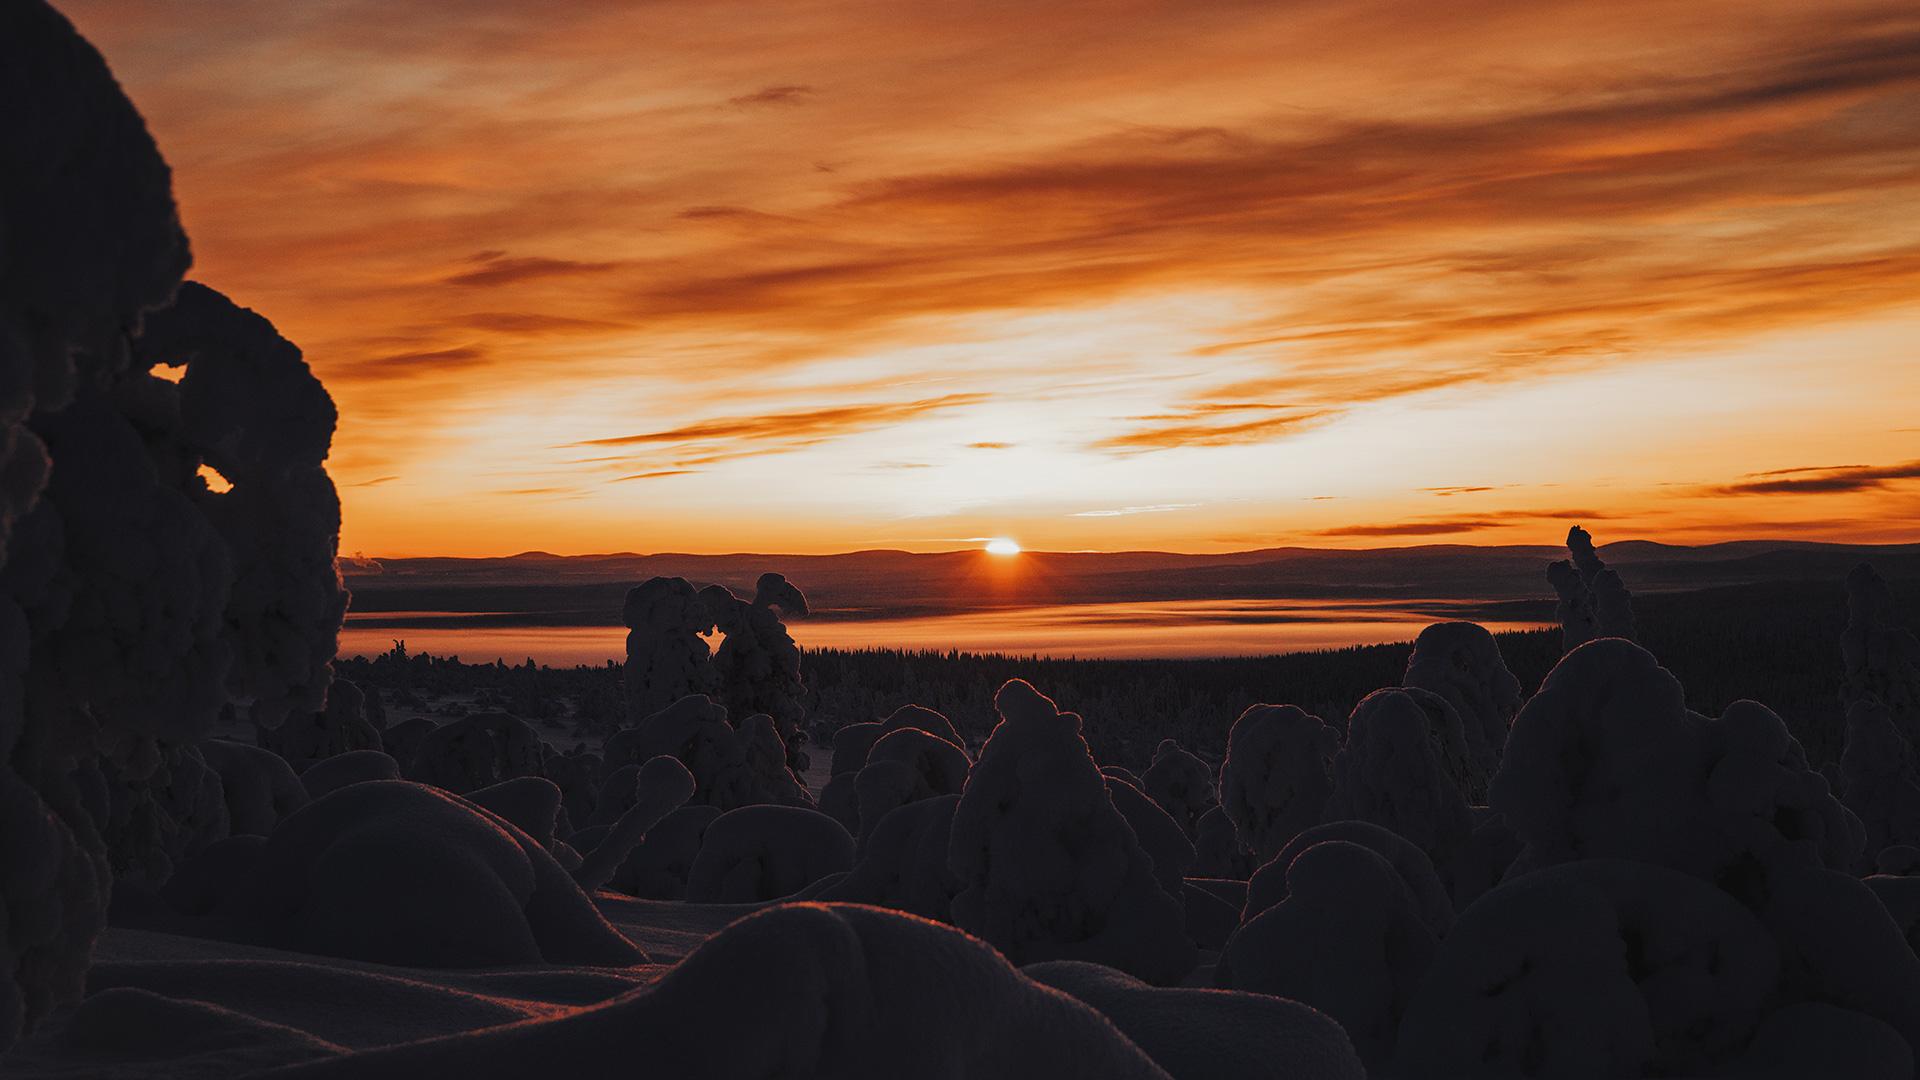 Lapland sunset forest Raphaelle Monvoisin